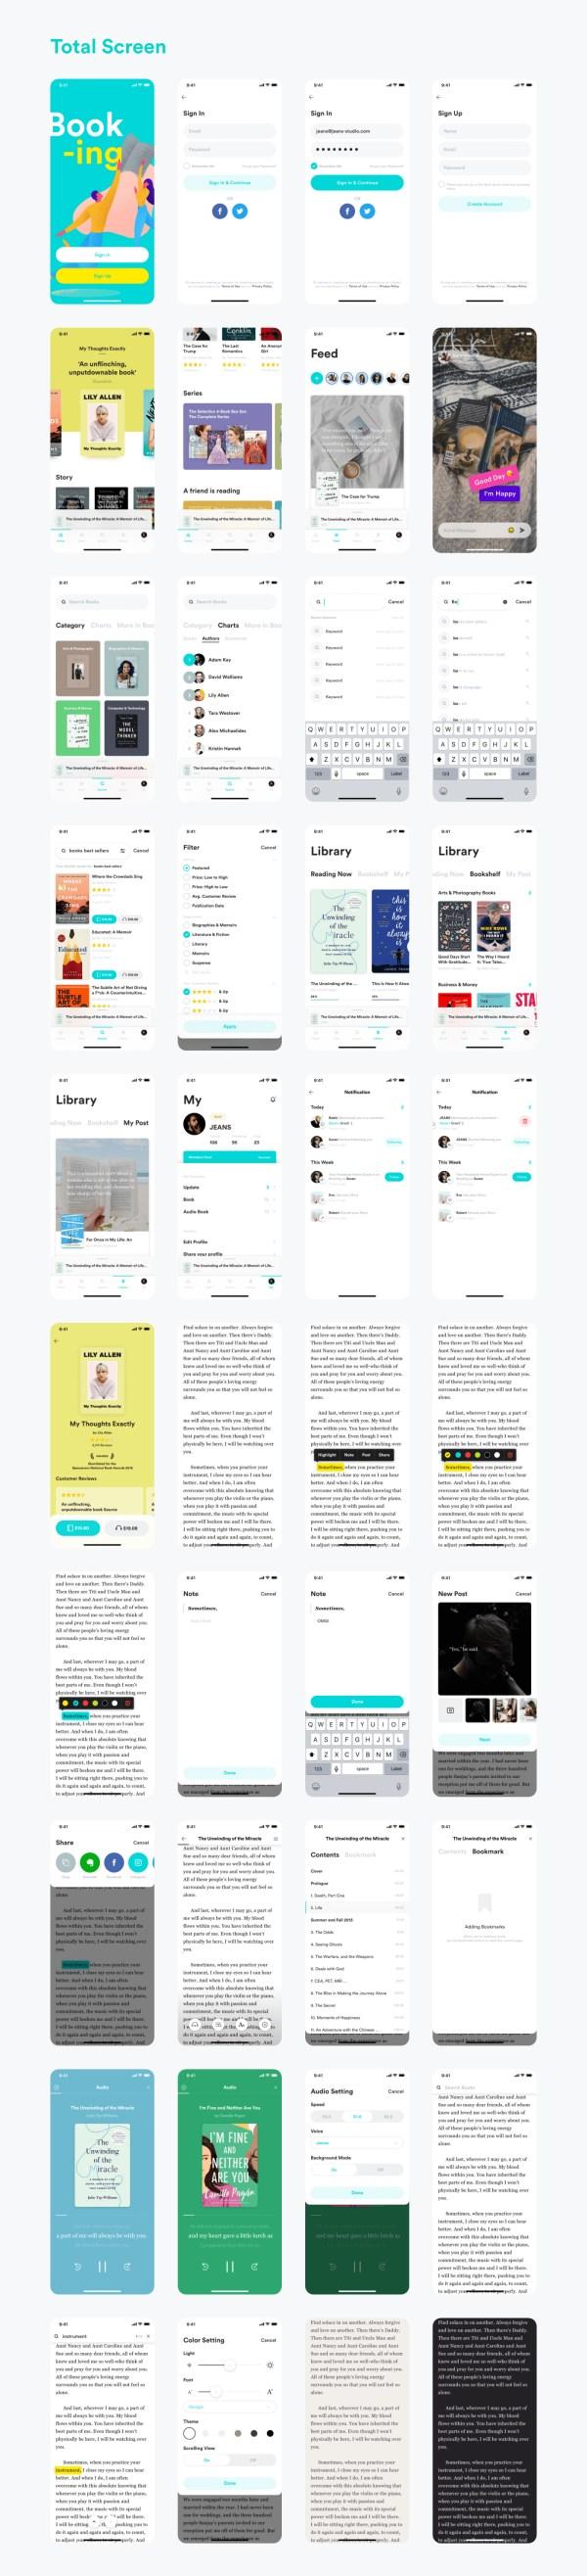 BookStore App Free UI Kit 02